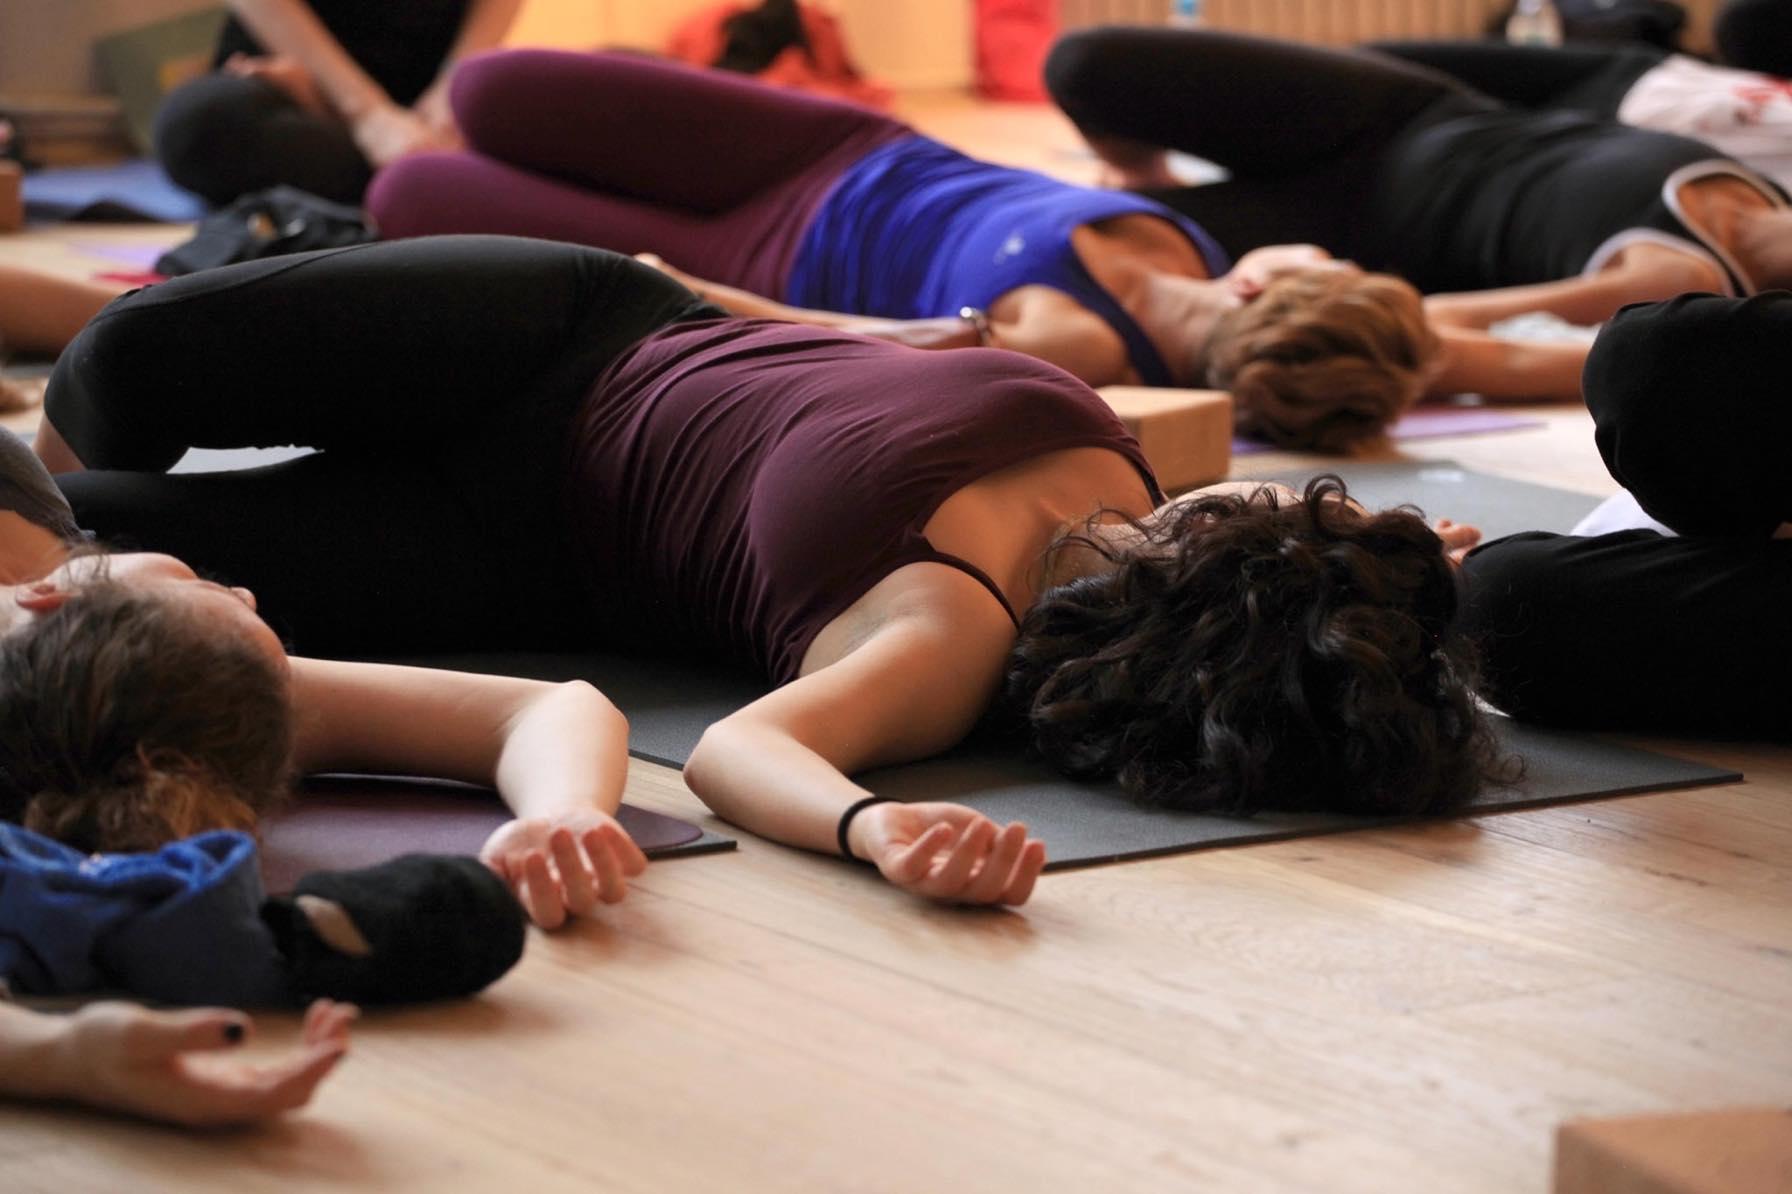 Yin Yoga martedì ore 20.00 (Pordenone), sabato ore 9.00 (Concordia Sagittaria)